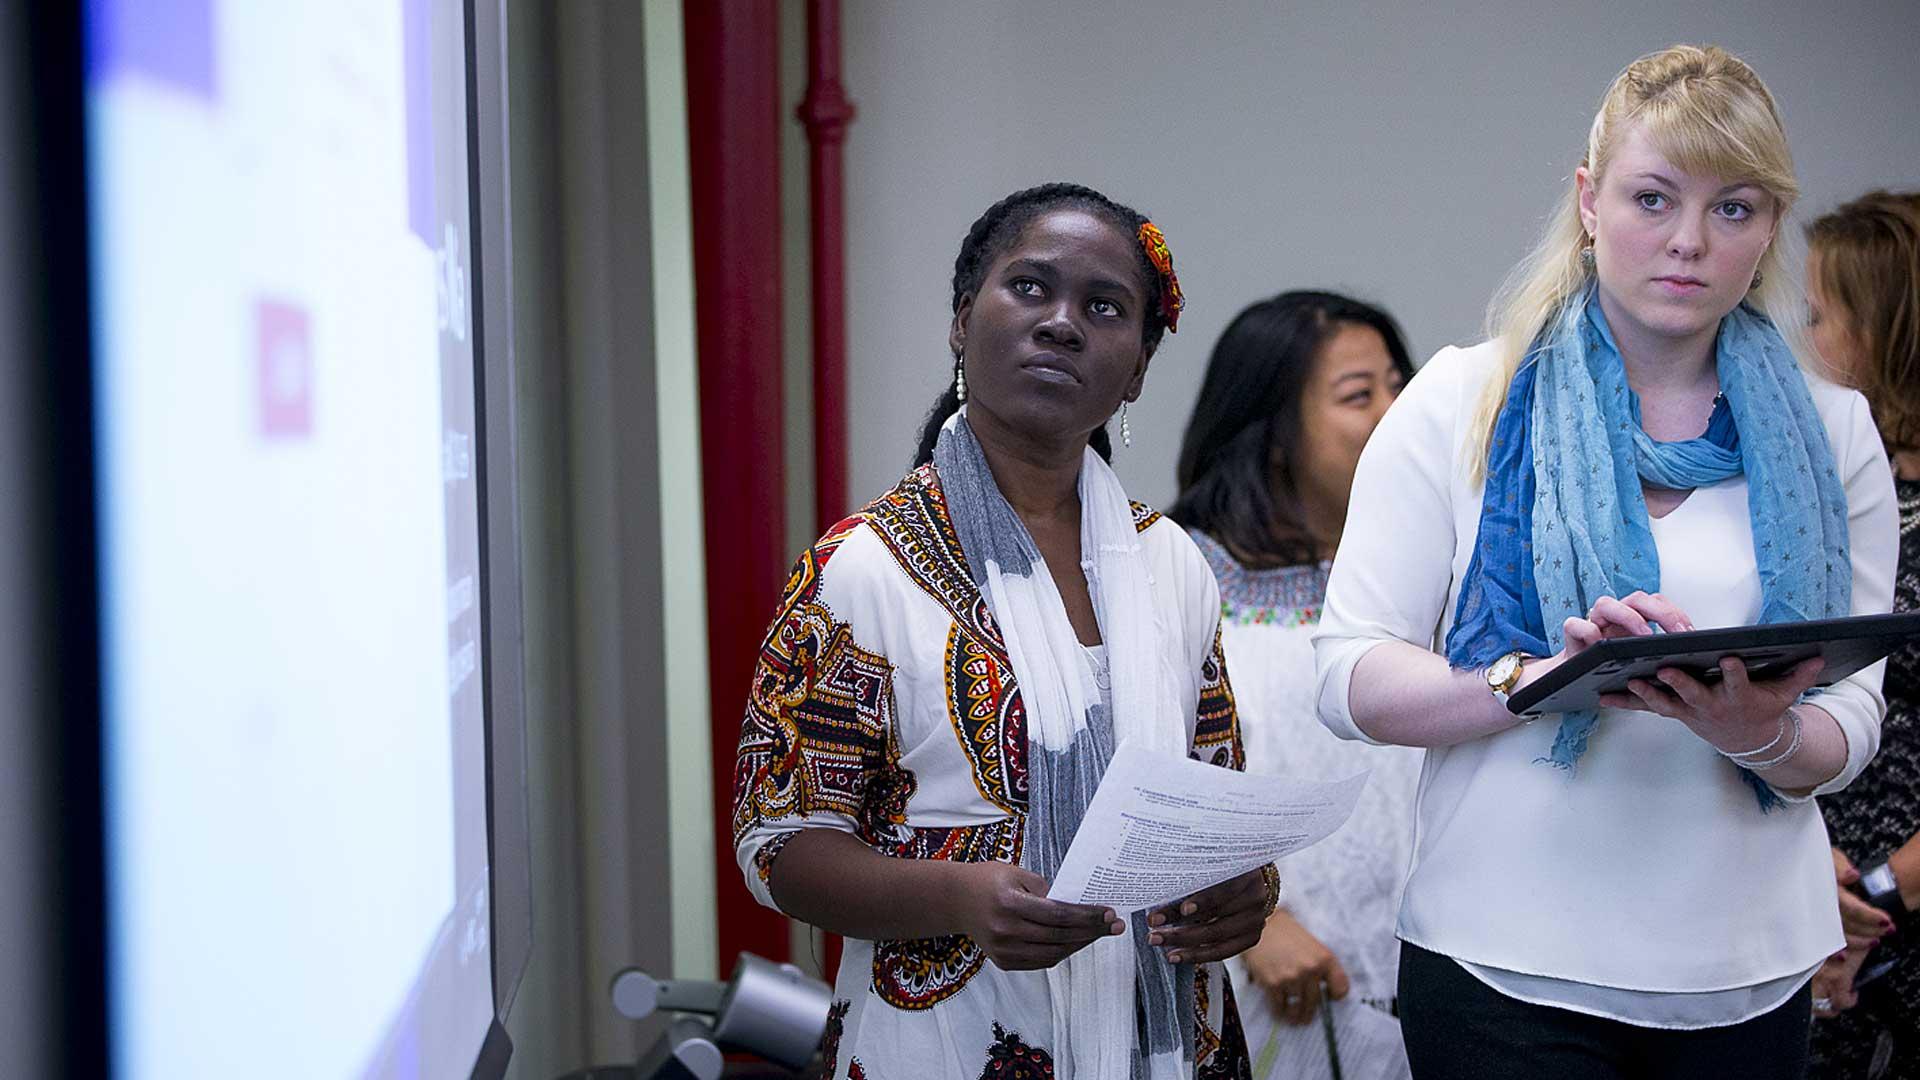 International Students Nyu School Of Global Public Health